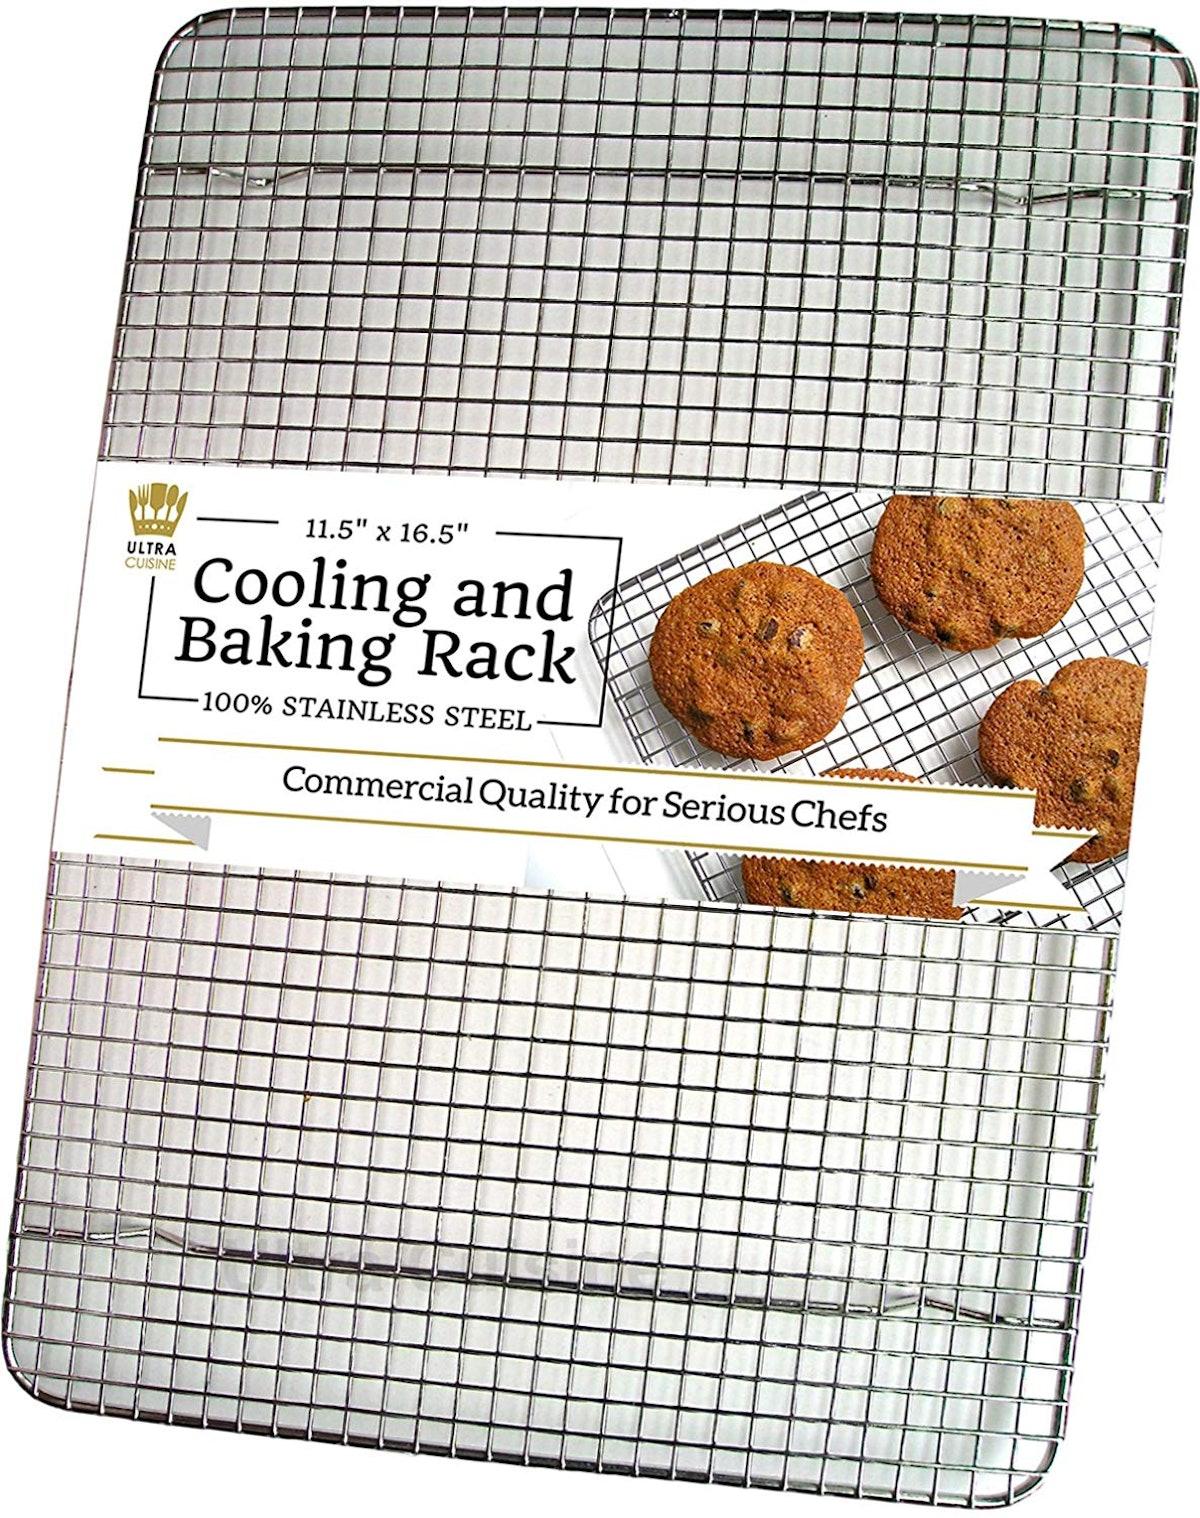 Ultra Cuisine Cooling Rack